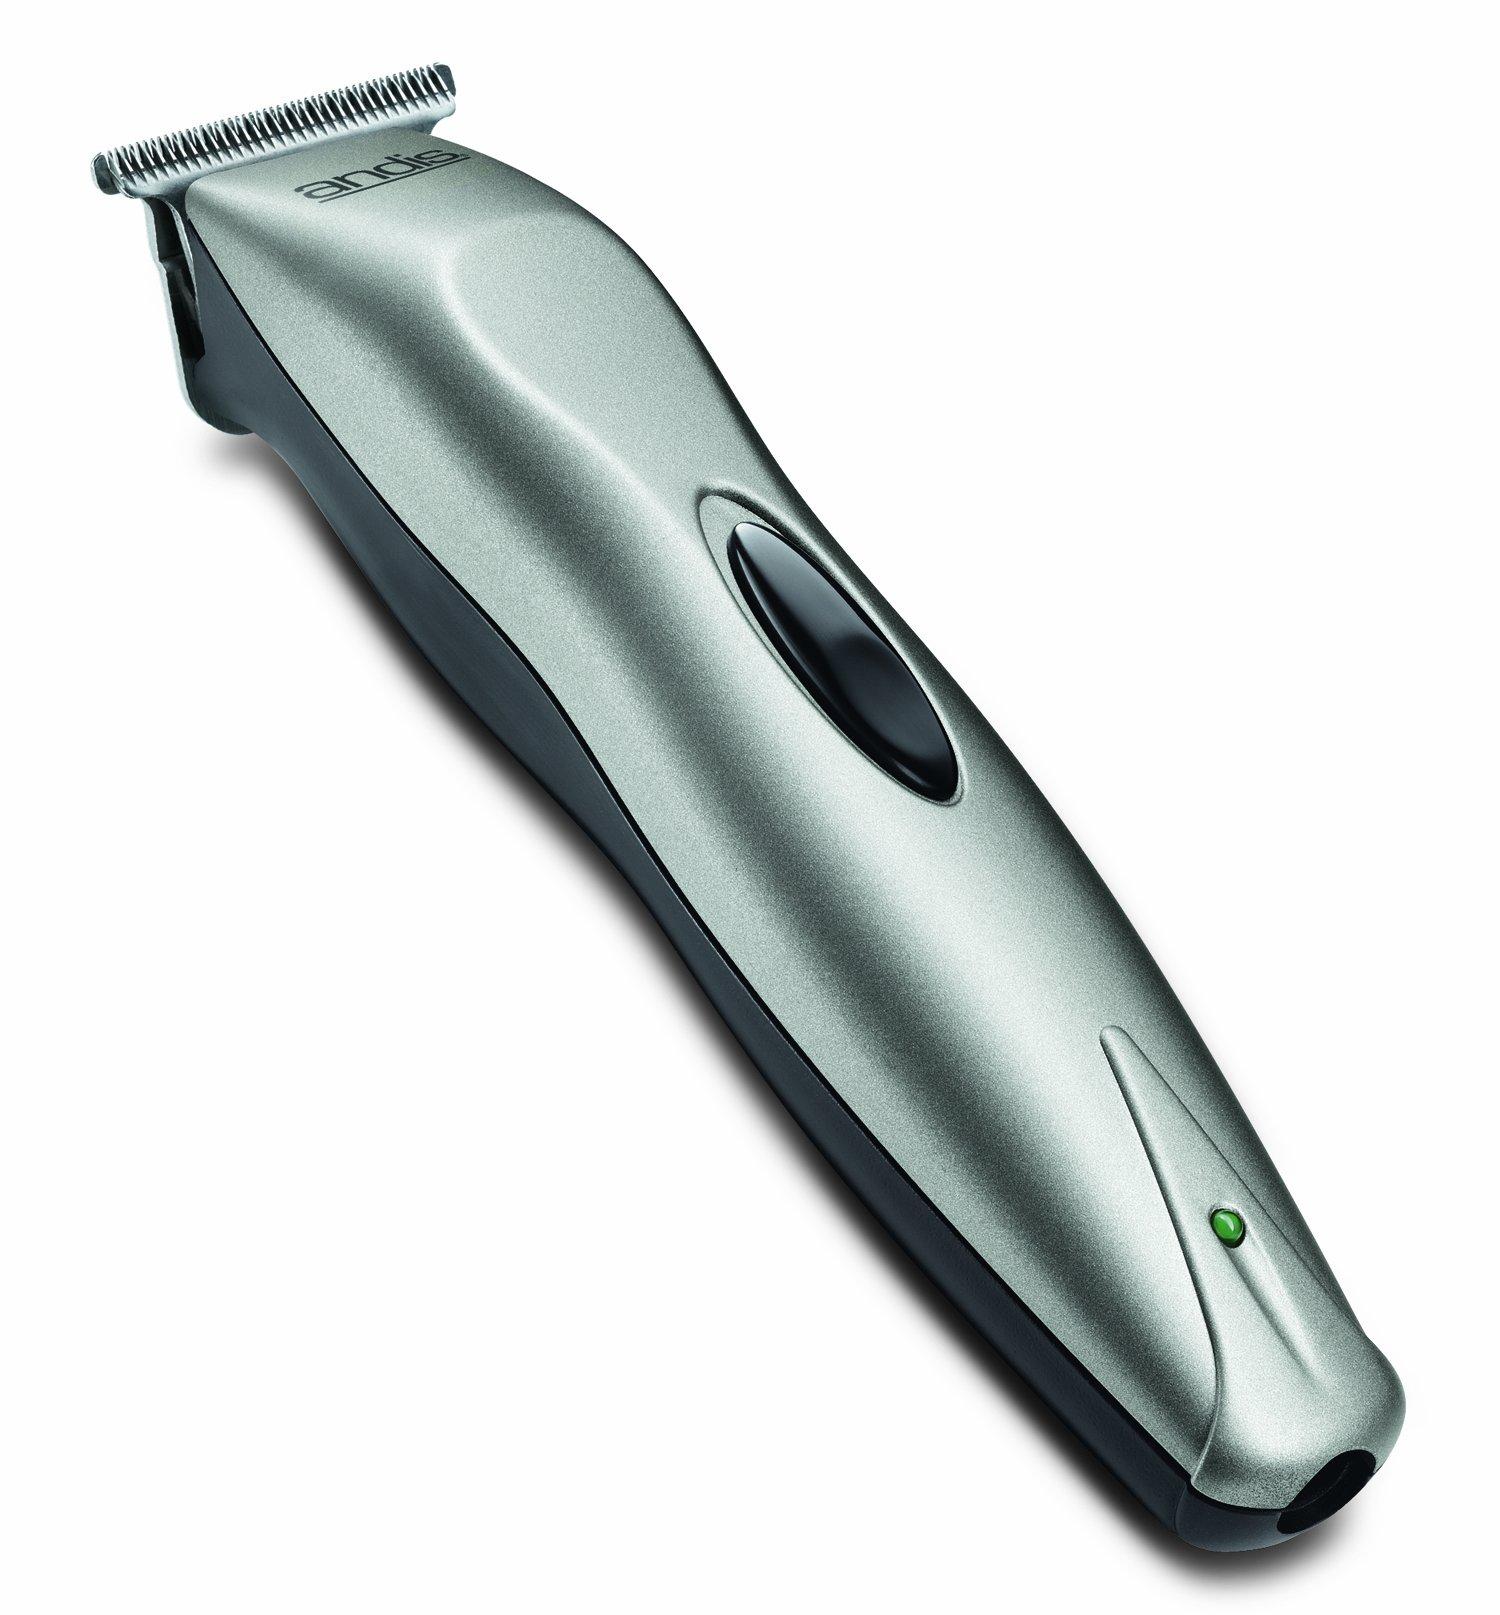 Andis VersaTrim Cordless 14-Piece Beard/Hair Trimmer Kit, Silver, Model BTF (22725)